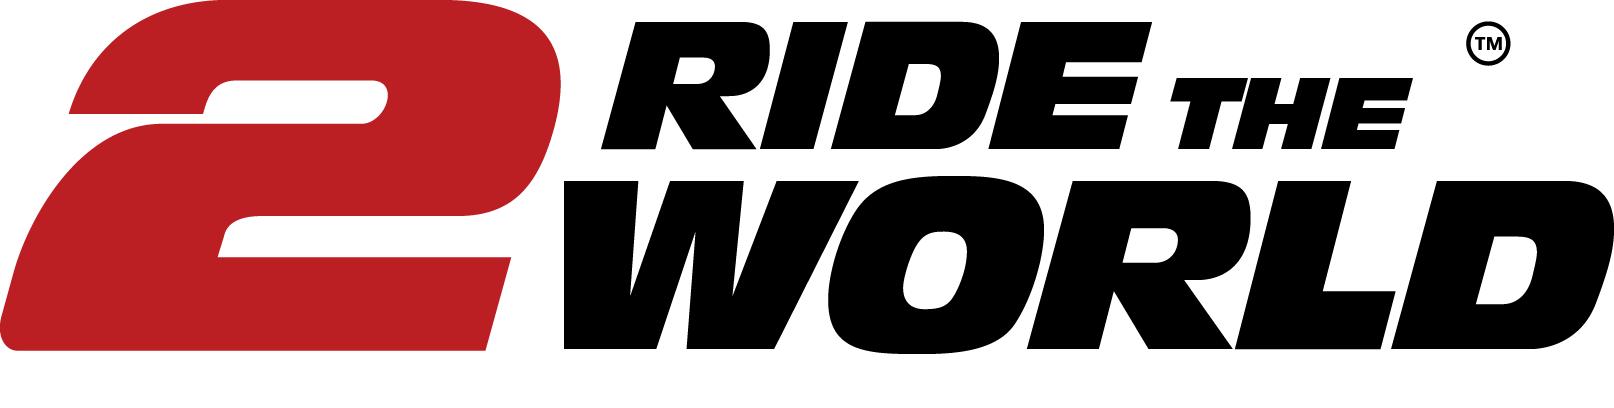 logo of 2 ride the world